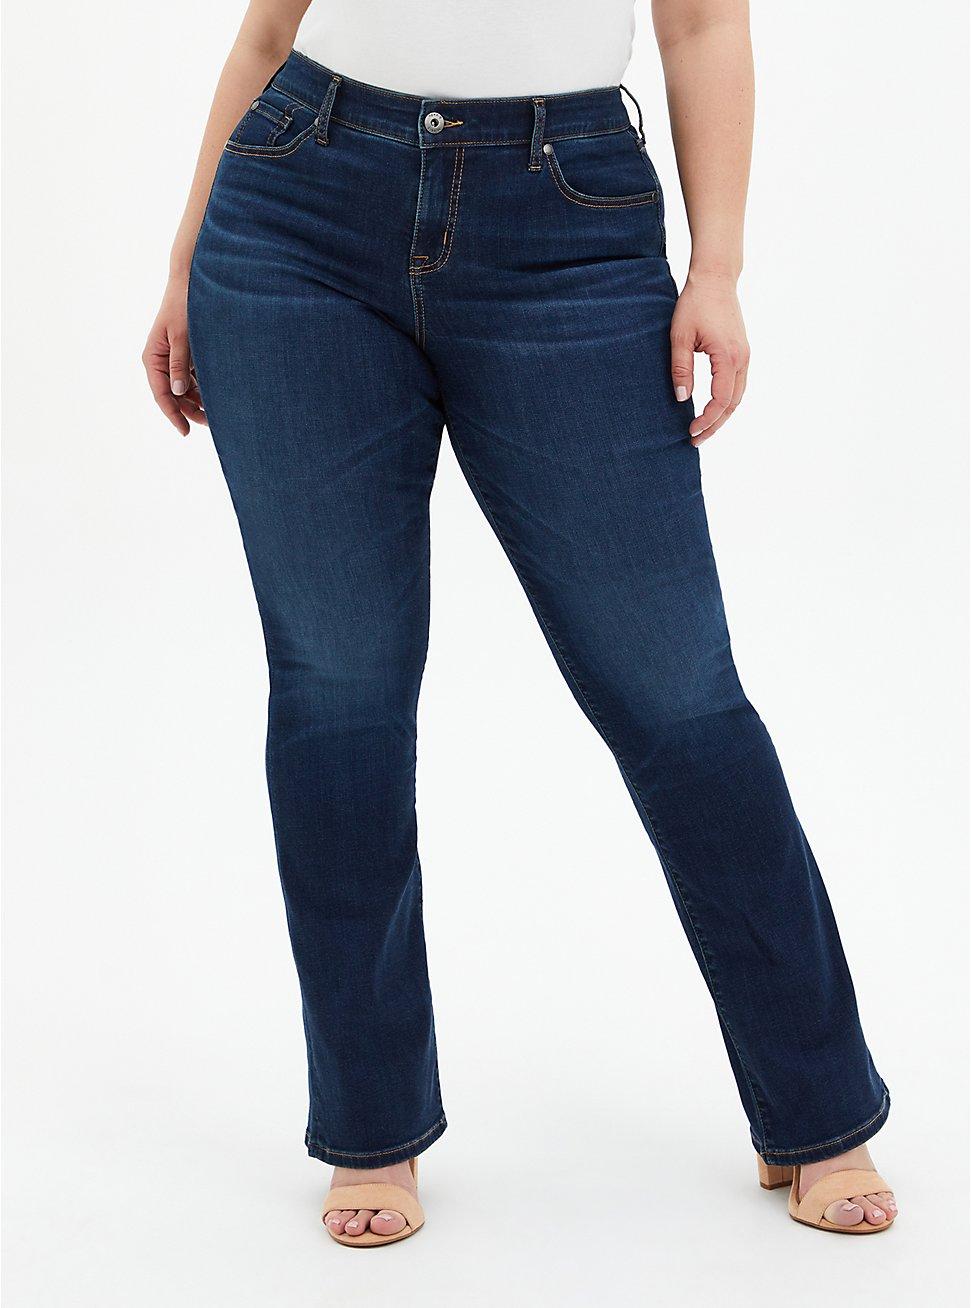 Mid Rise Slim Boot Jean - Super Soft Eco Medium Wash , HYDROSPHERE, hi-res